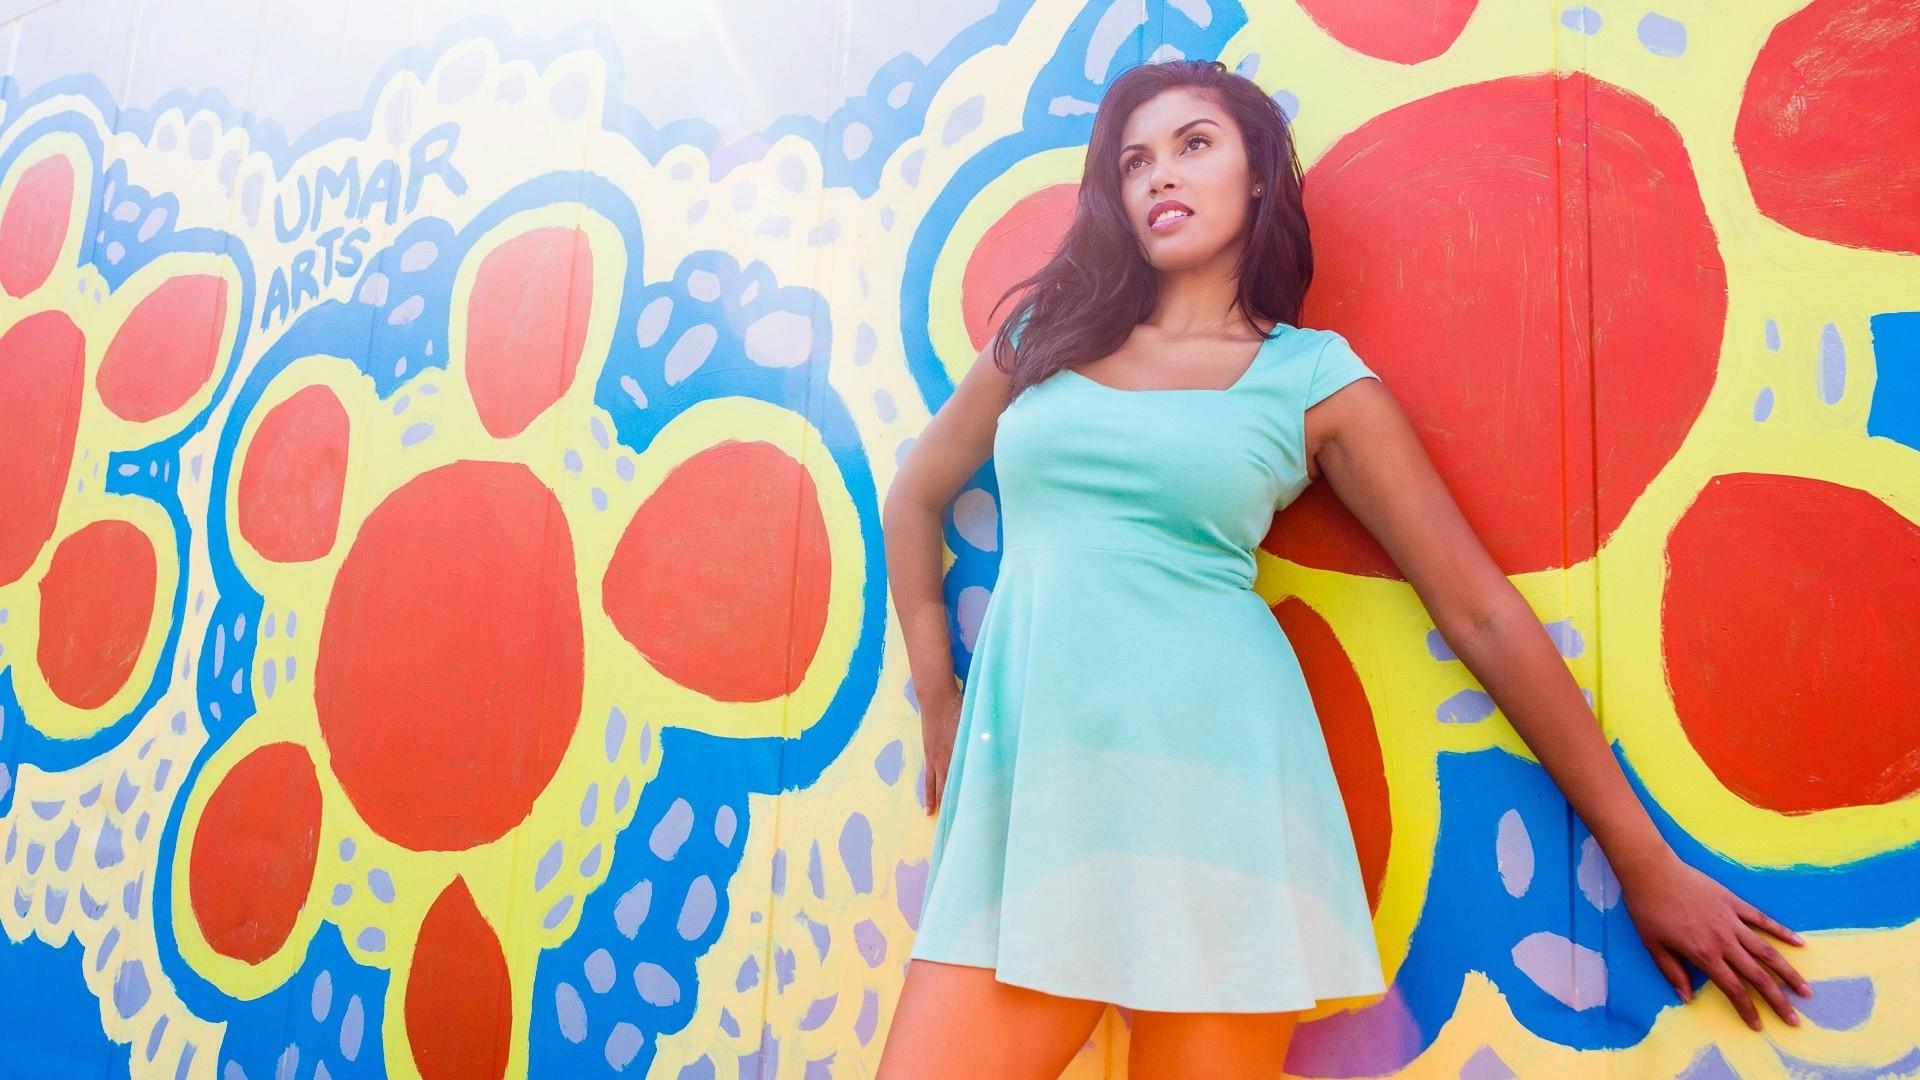 Wallpaper : colorful, illustration, women, model, minidress, wall ...